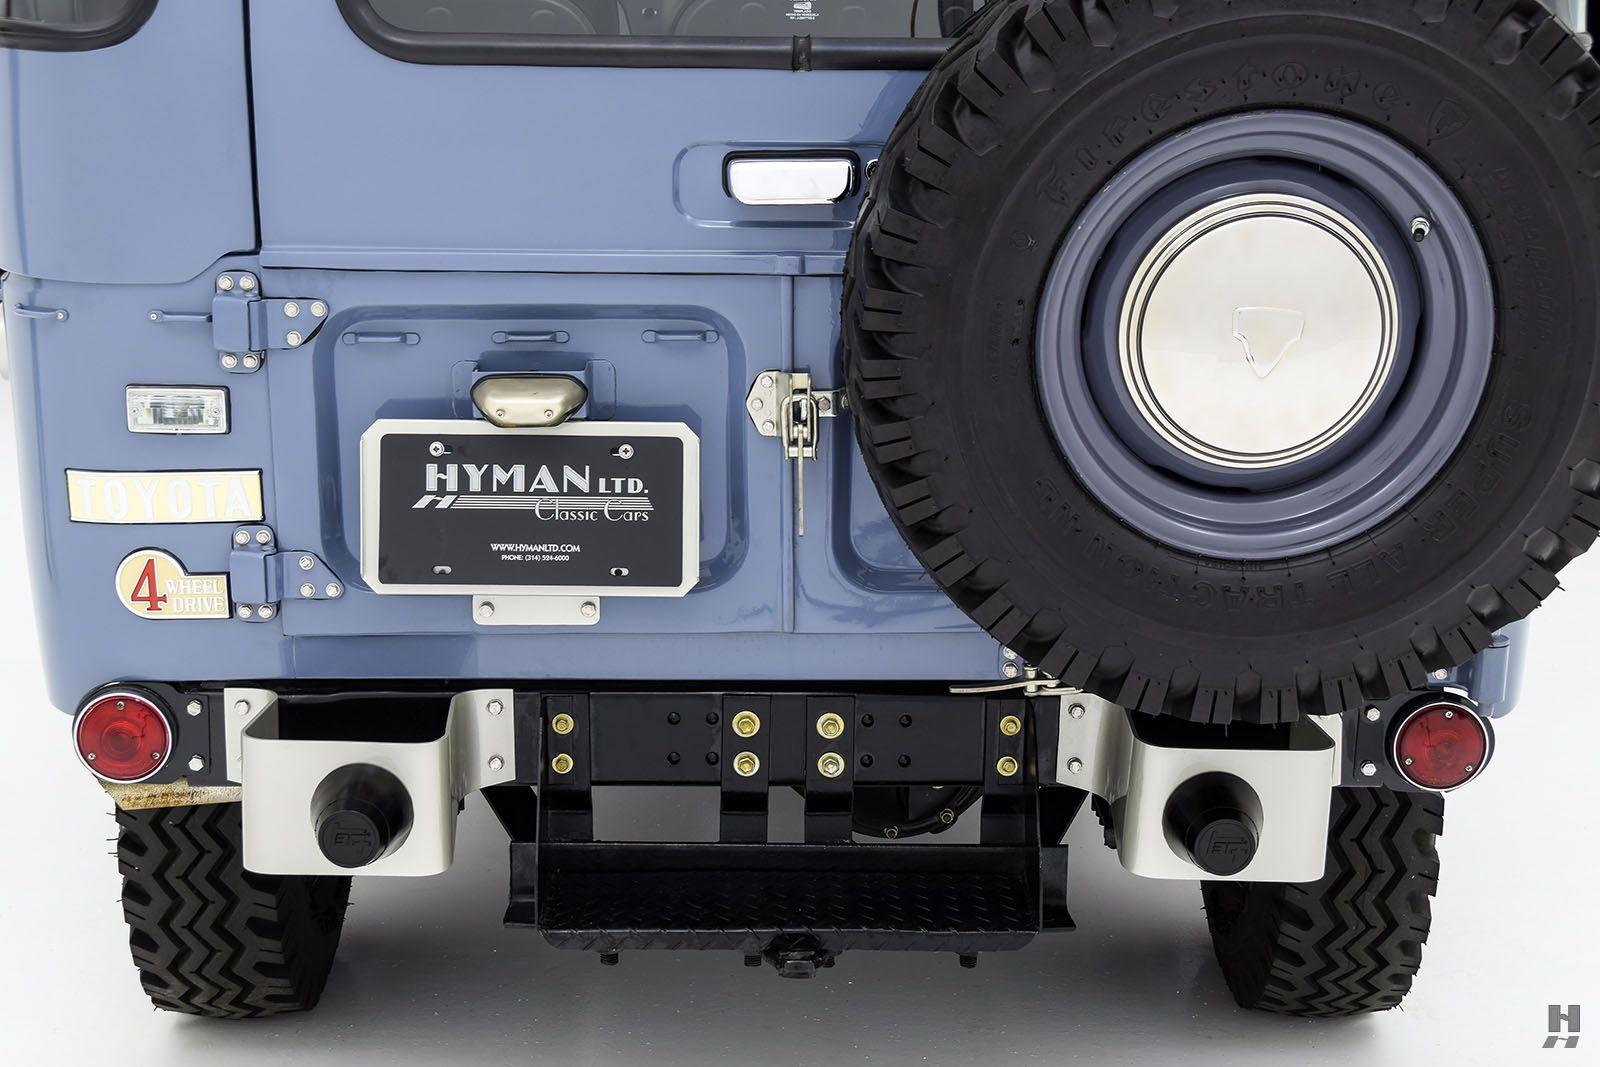 1968 Toyota Fj40 Land Cruiser For Sale Classic Cars Hyman Ltd In 2020 Toyota Fj40 Fj40 Land Cruiser